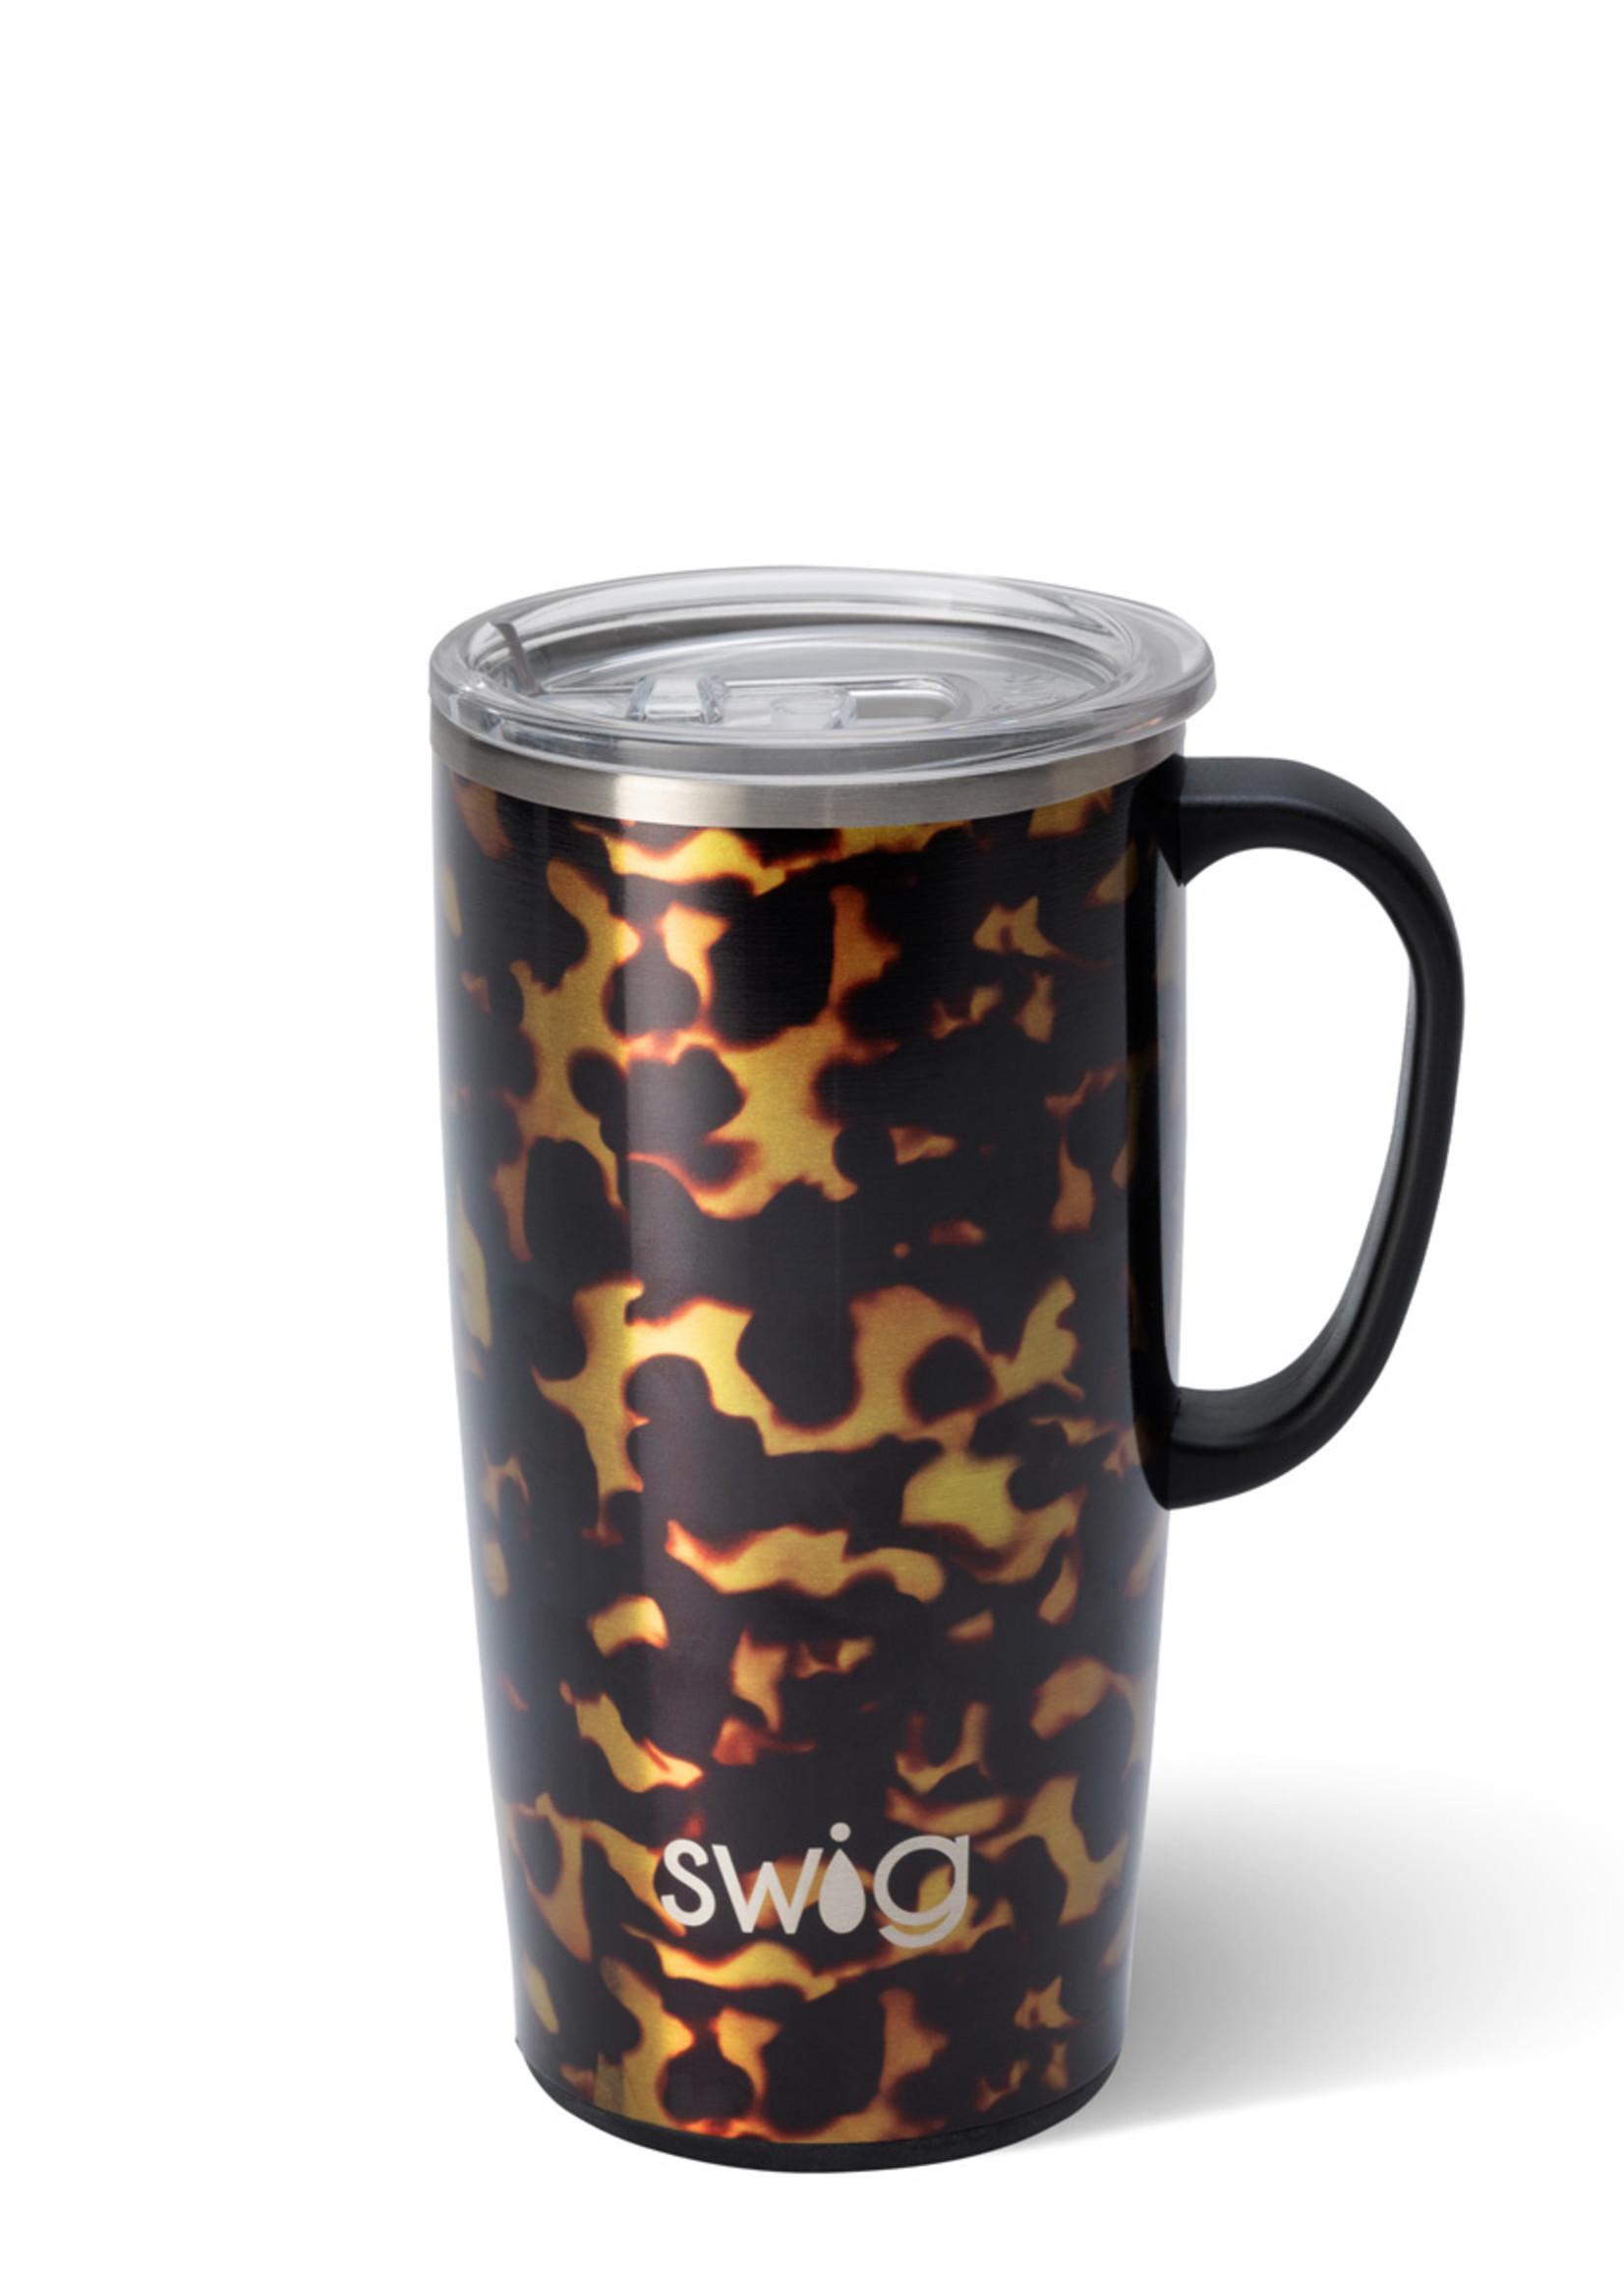 Swig Bomshell Mug 22oz